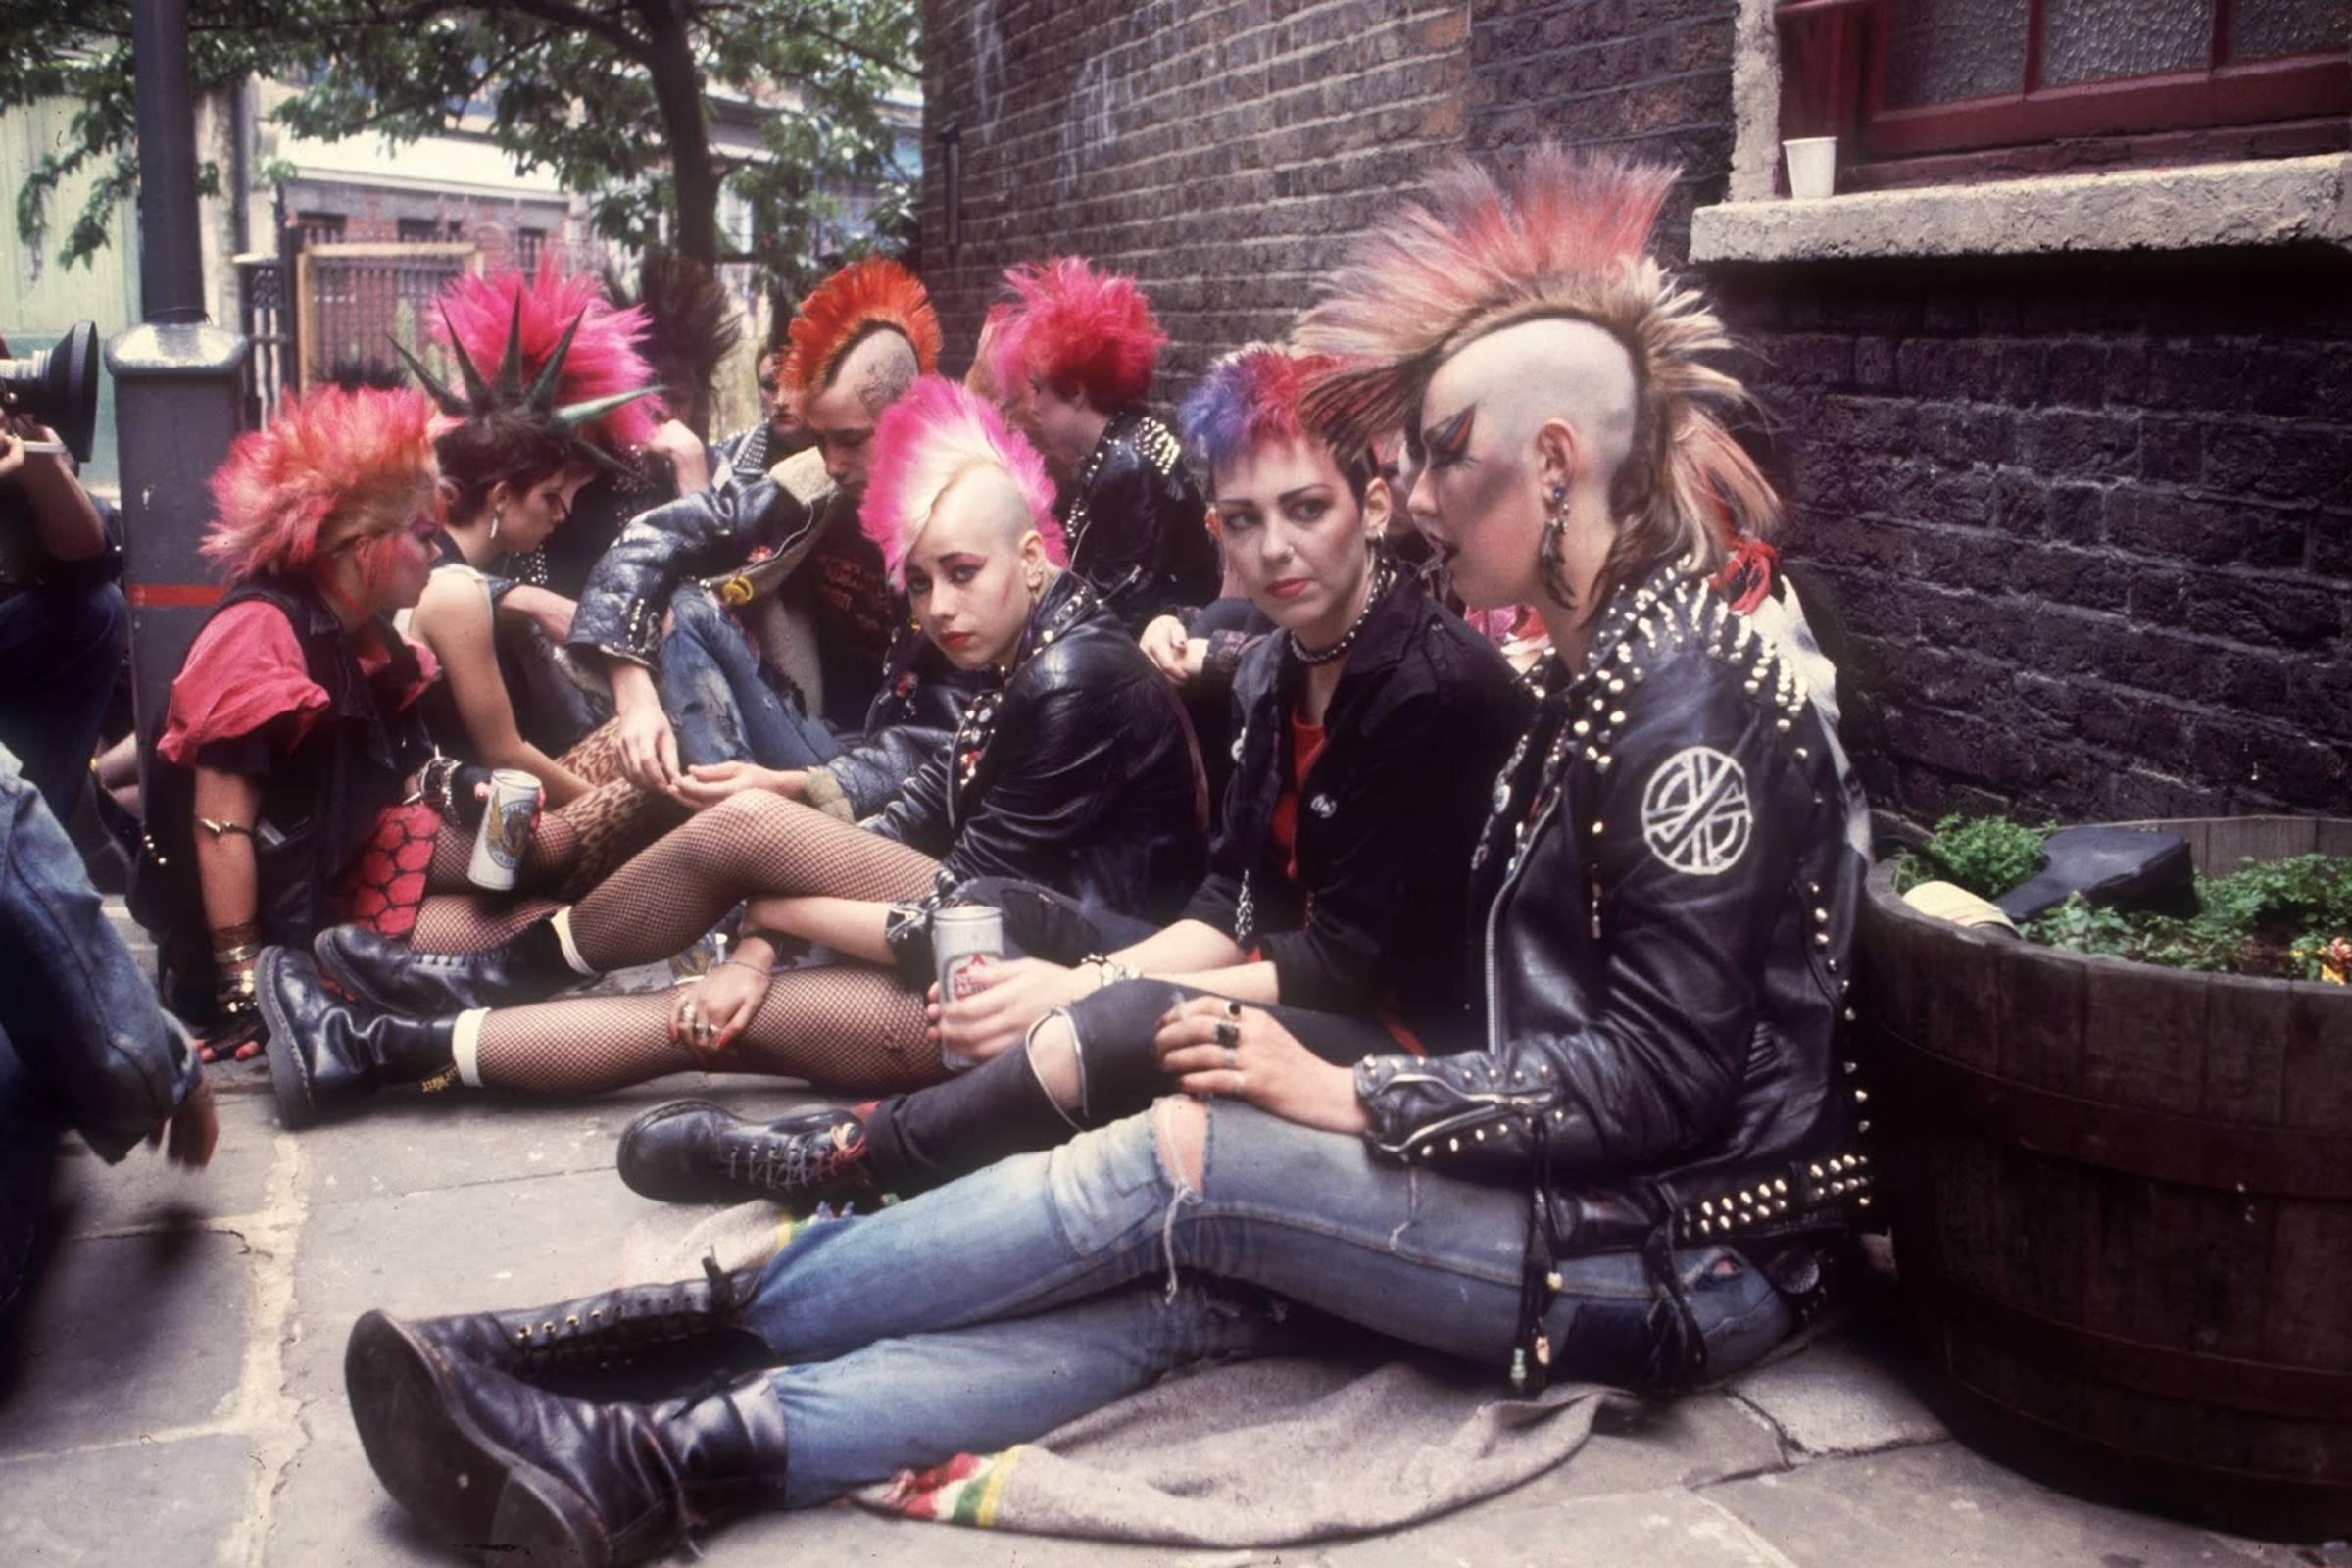 Панки в Dr. Martens, 1983 г.